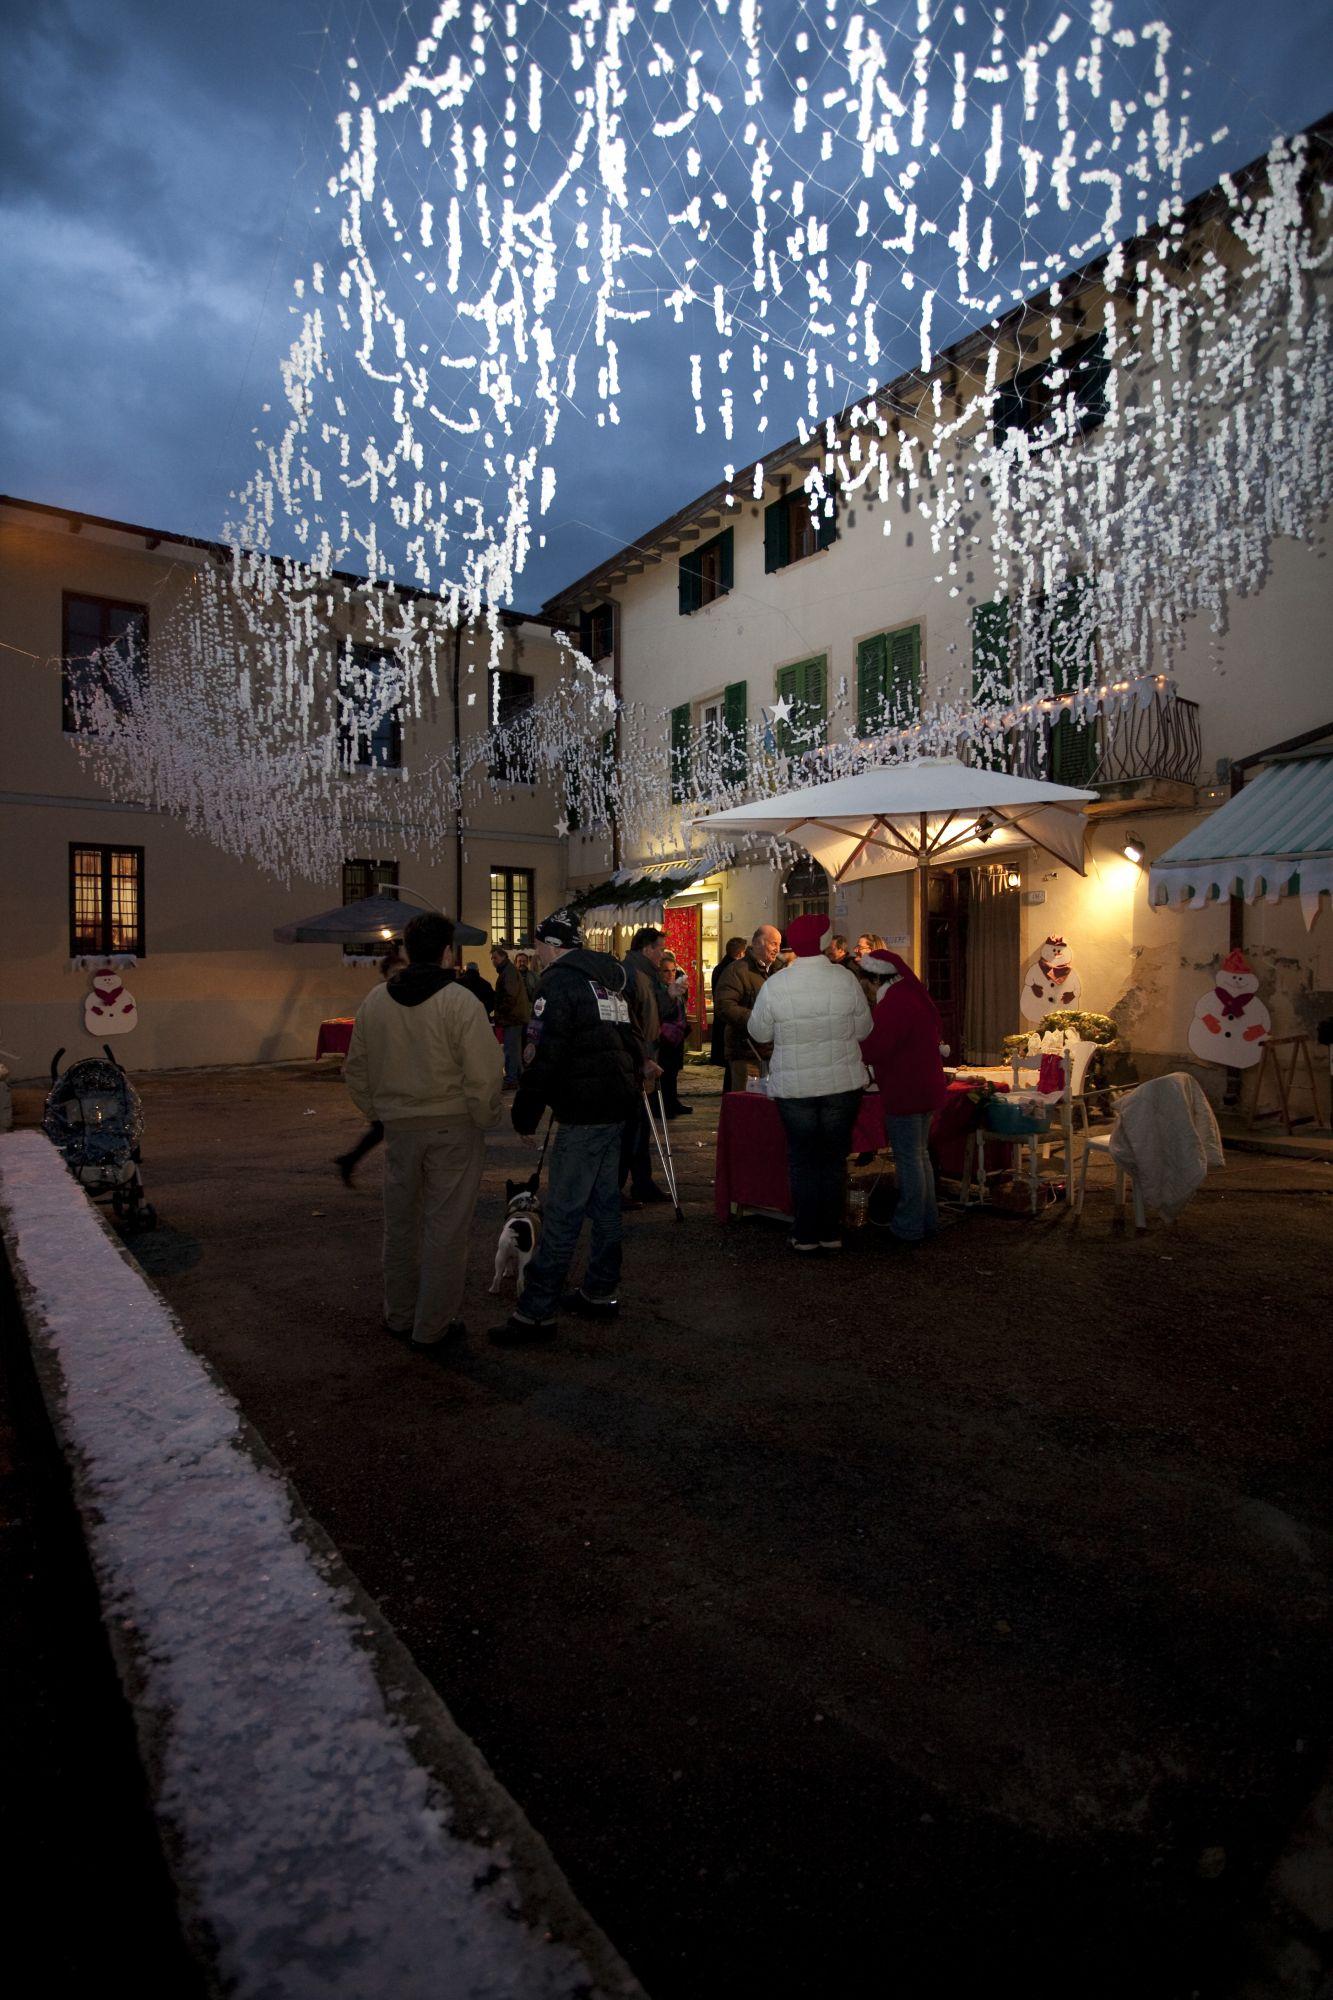 Magie di Natale fa tappa a Stiava